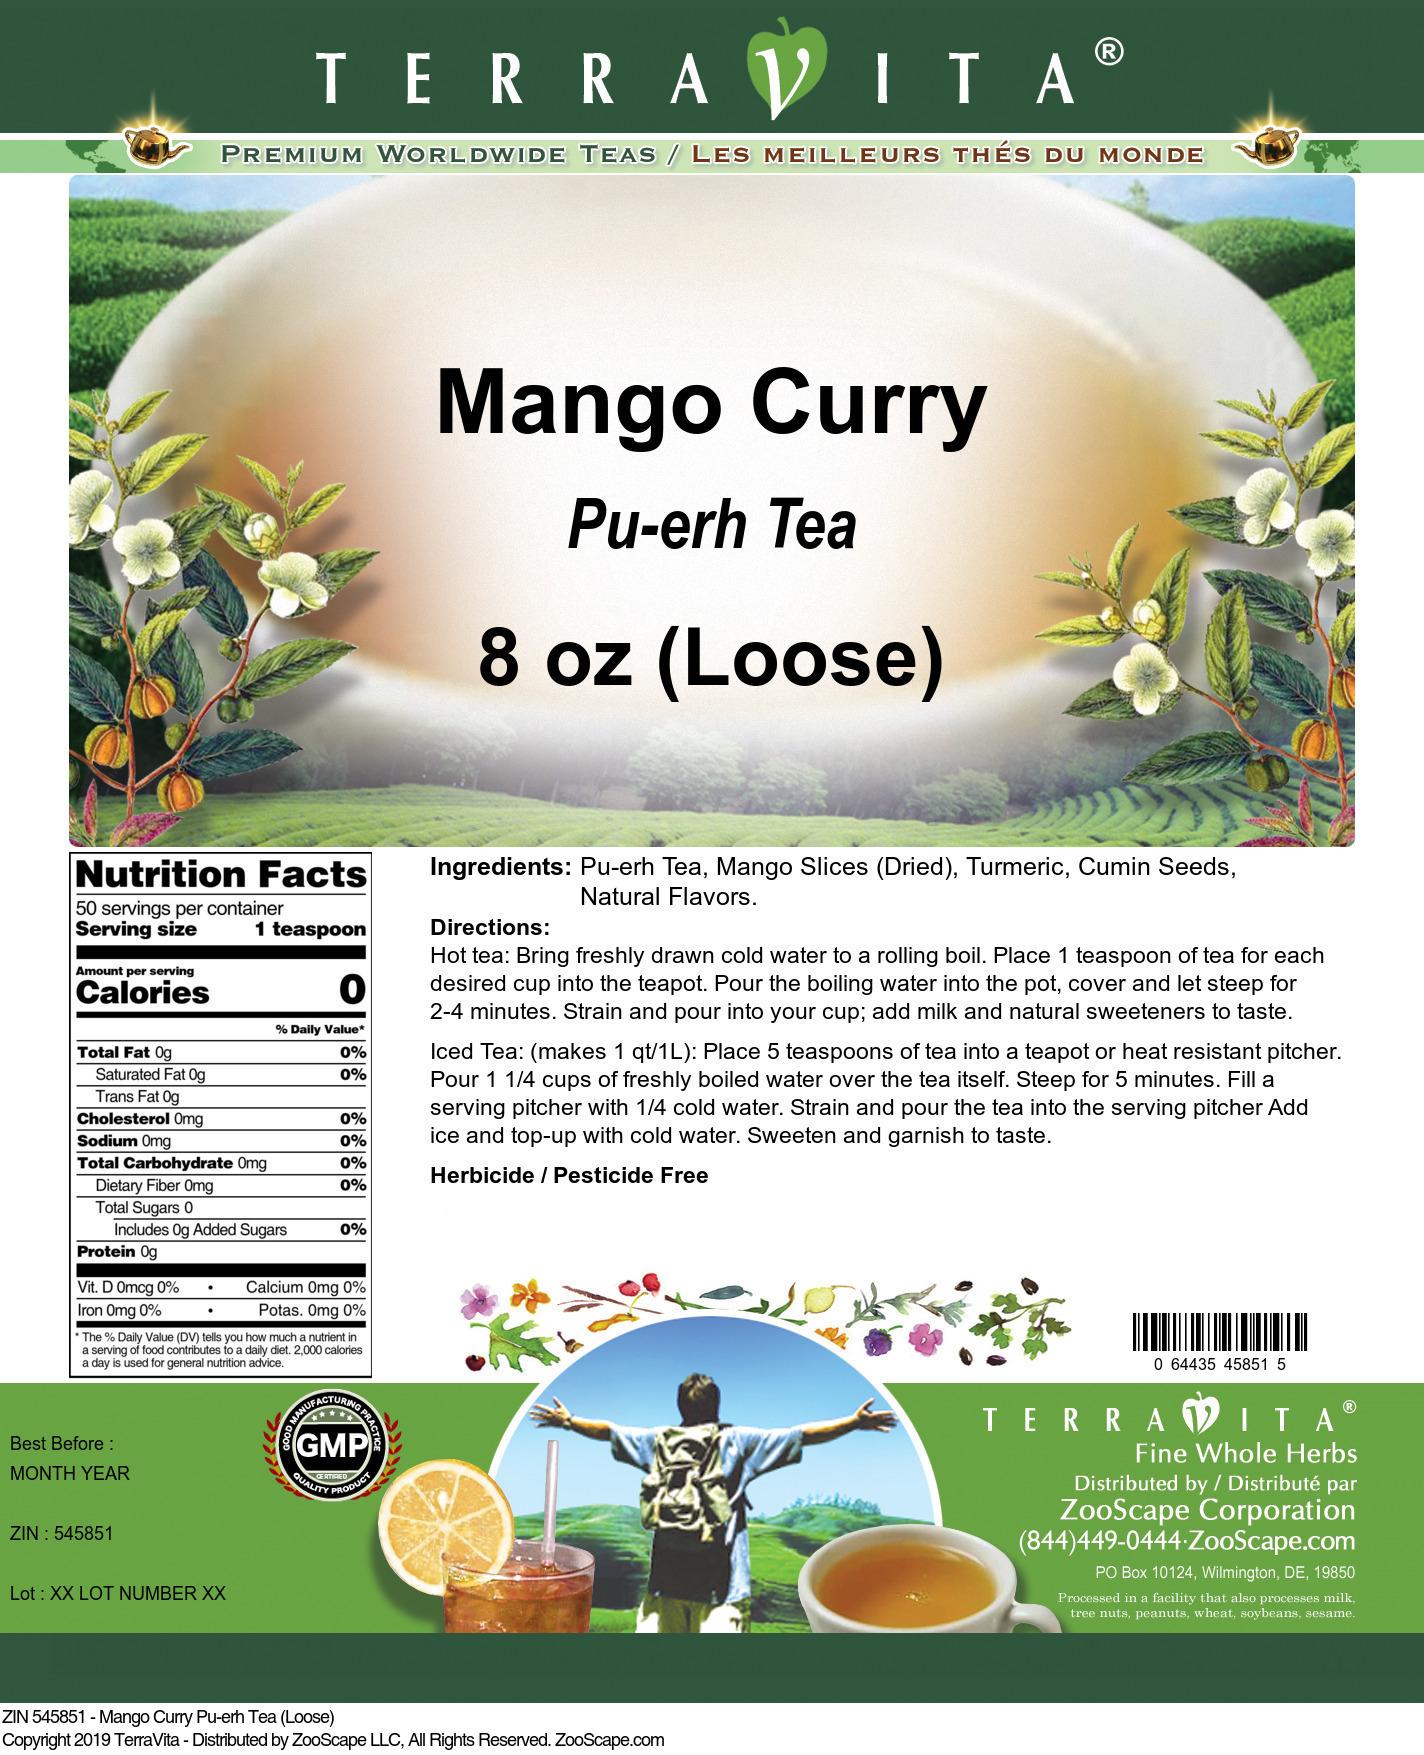 Mango Curry Pu-erh Tea